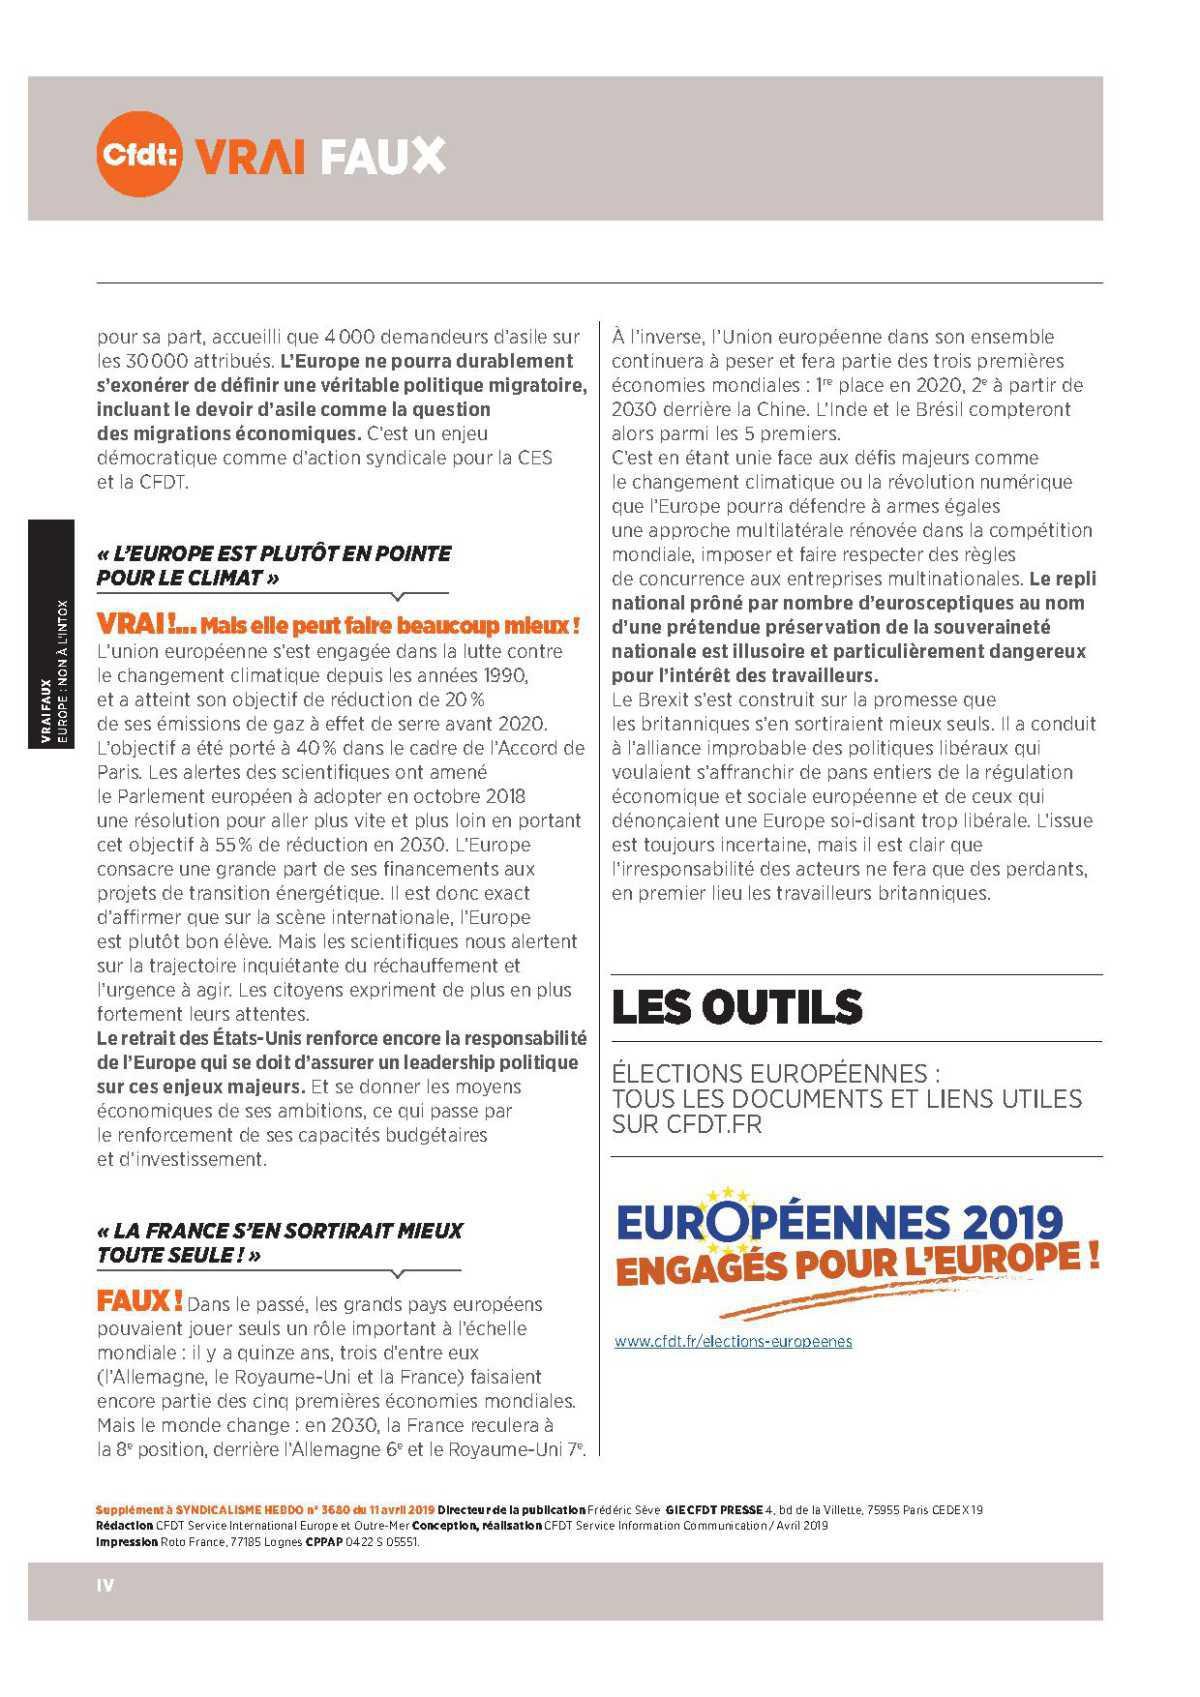 VRAI FAUX - EUROPE : NON À L'INTOX